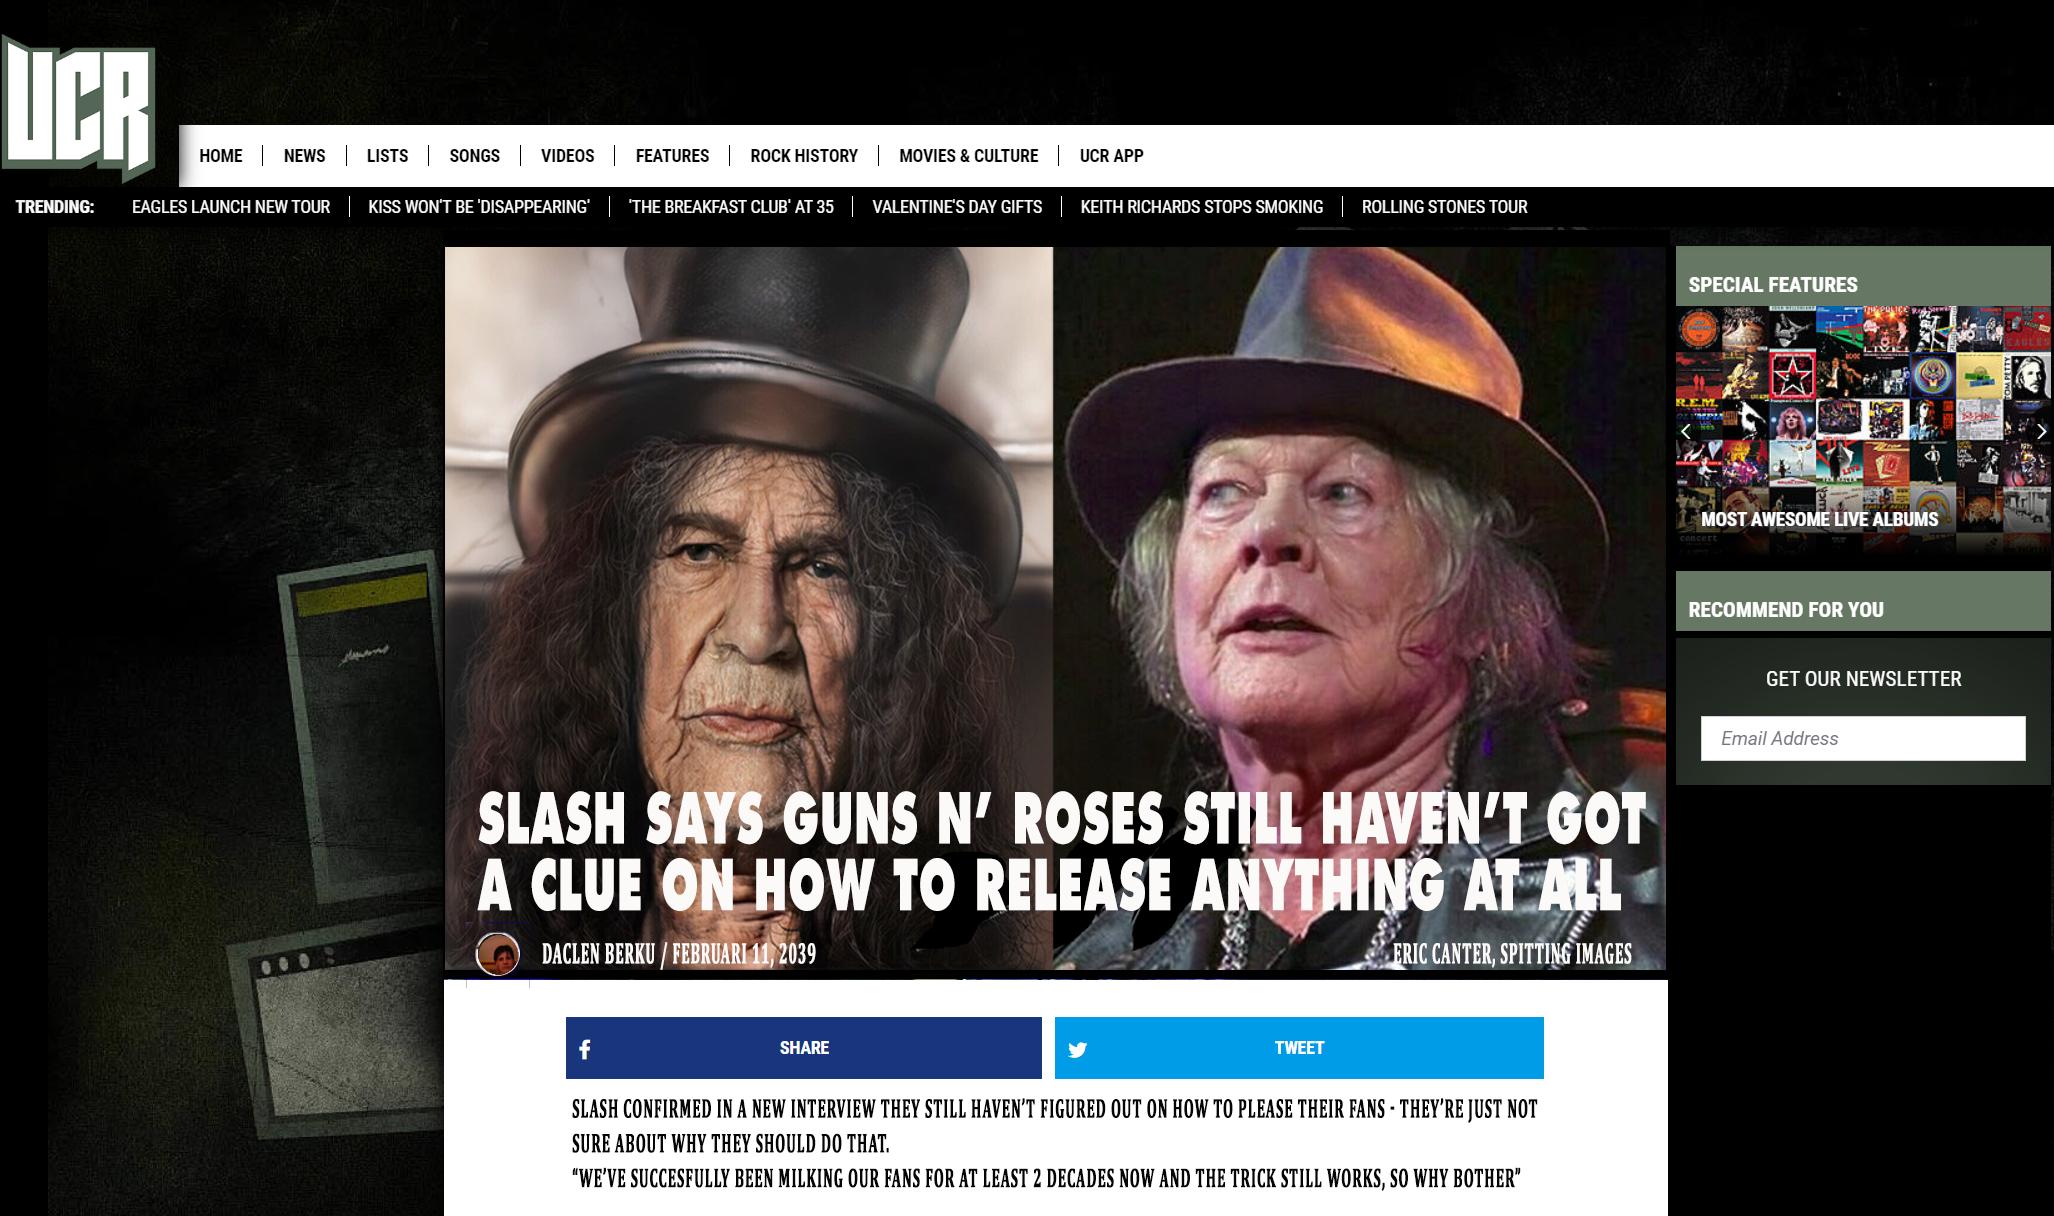 Axl reparte amor - Página 18 Ultimate_classic_rock_article